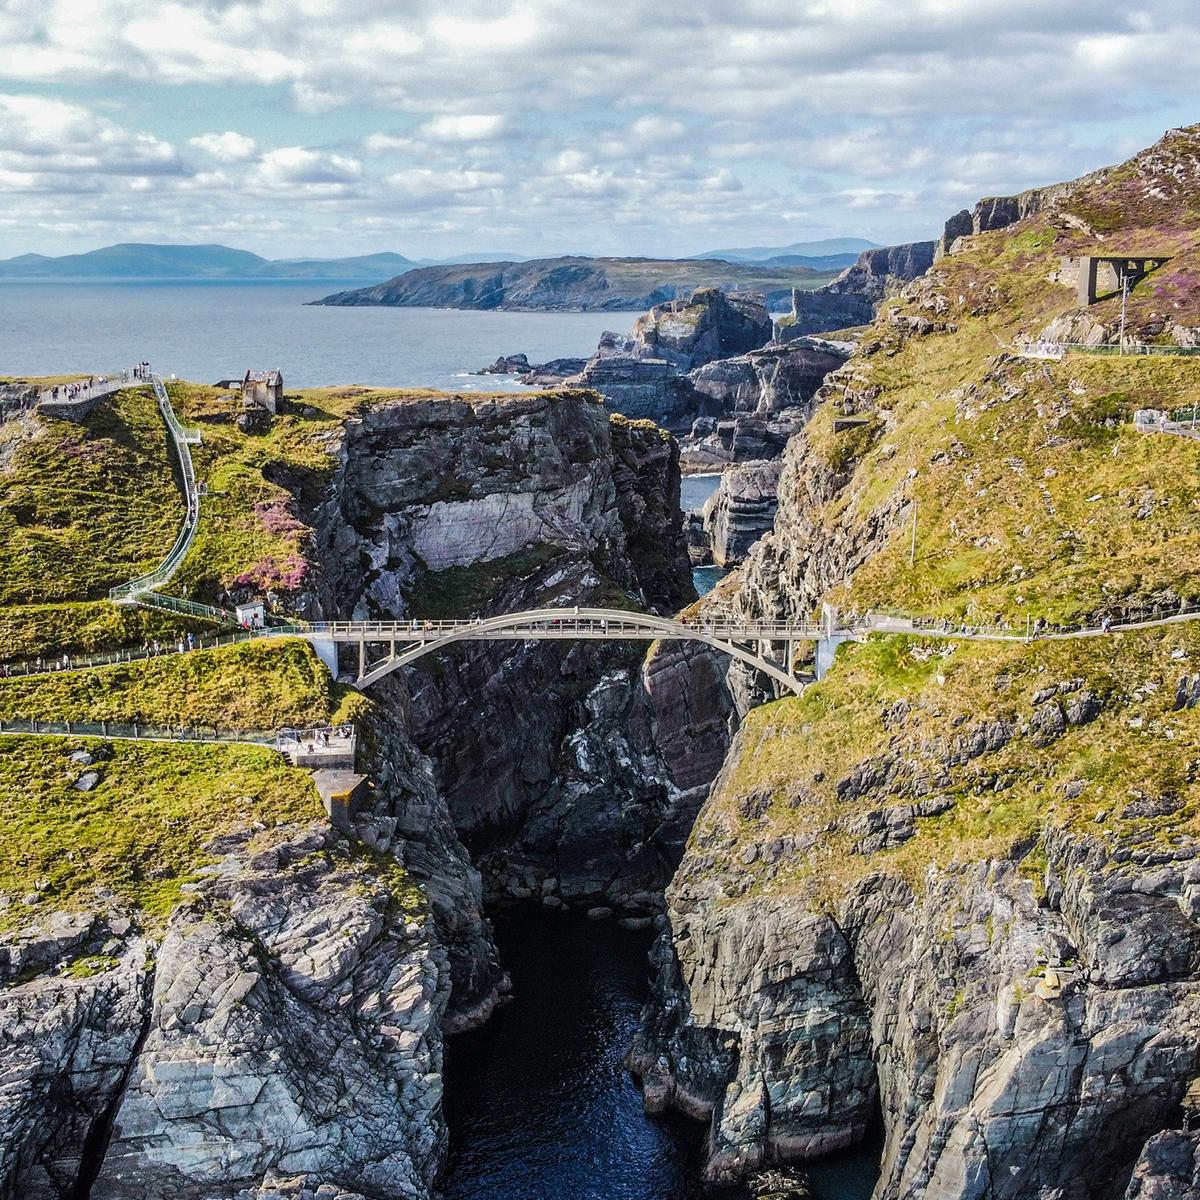 Rashed Henderson - Mizen Head, County Cork - We love Ireland